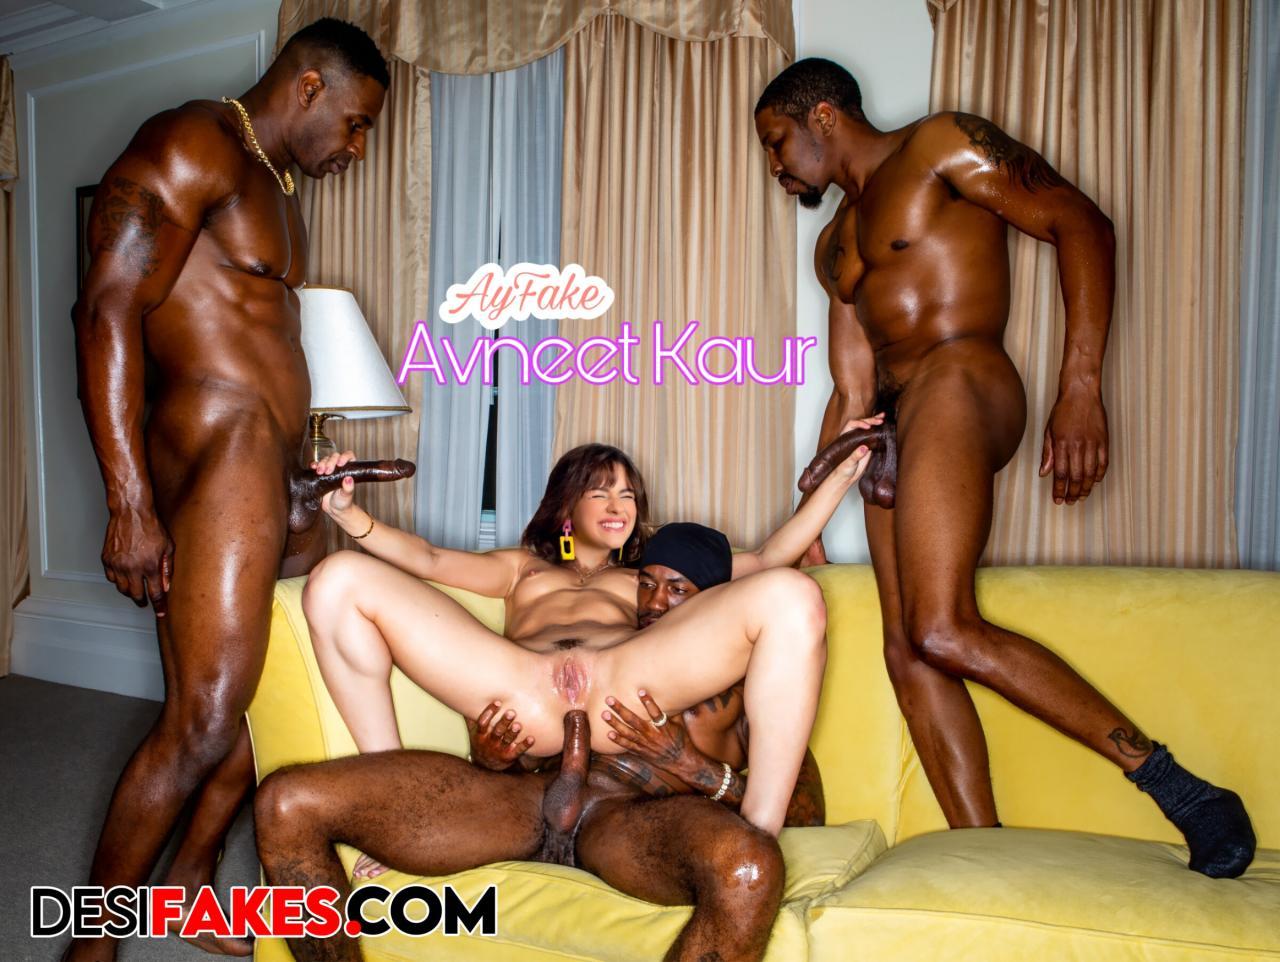 Avneet Kaur Nude Sexy Picks